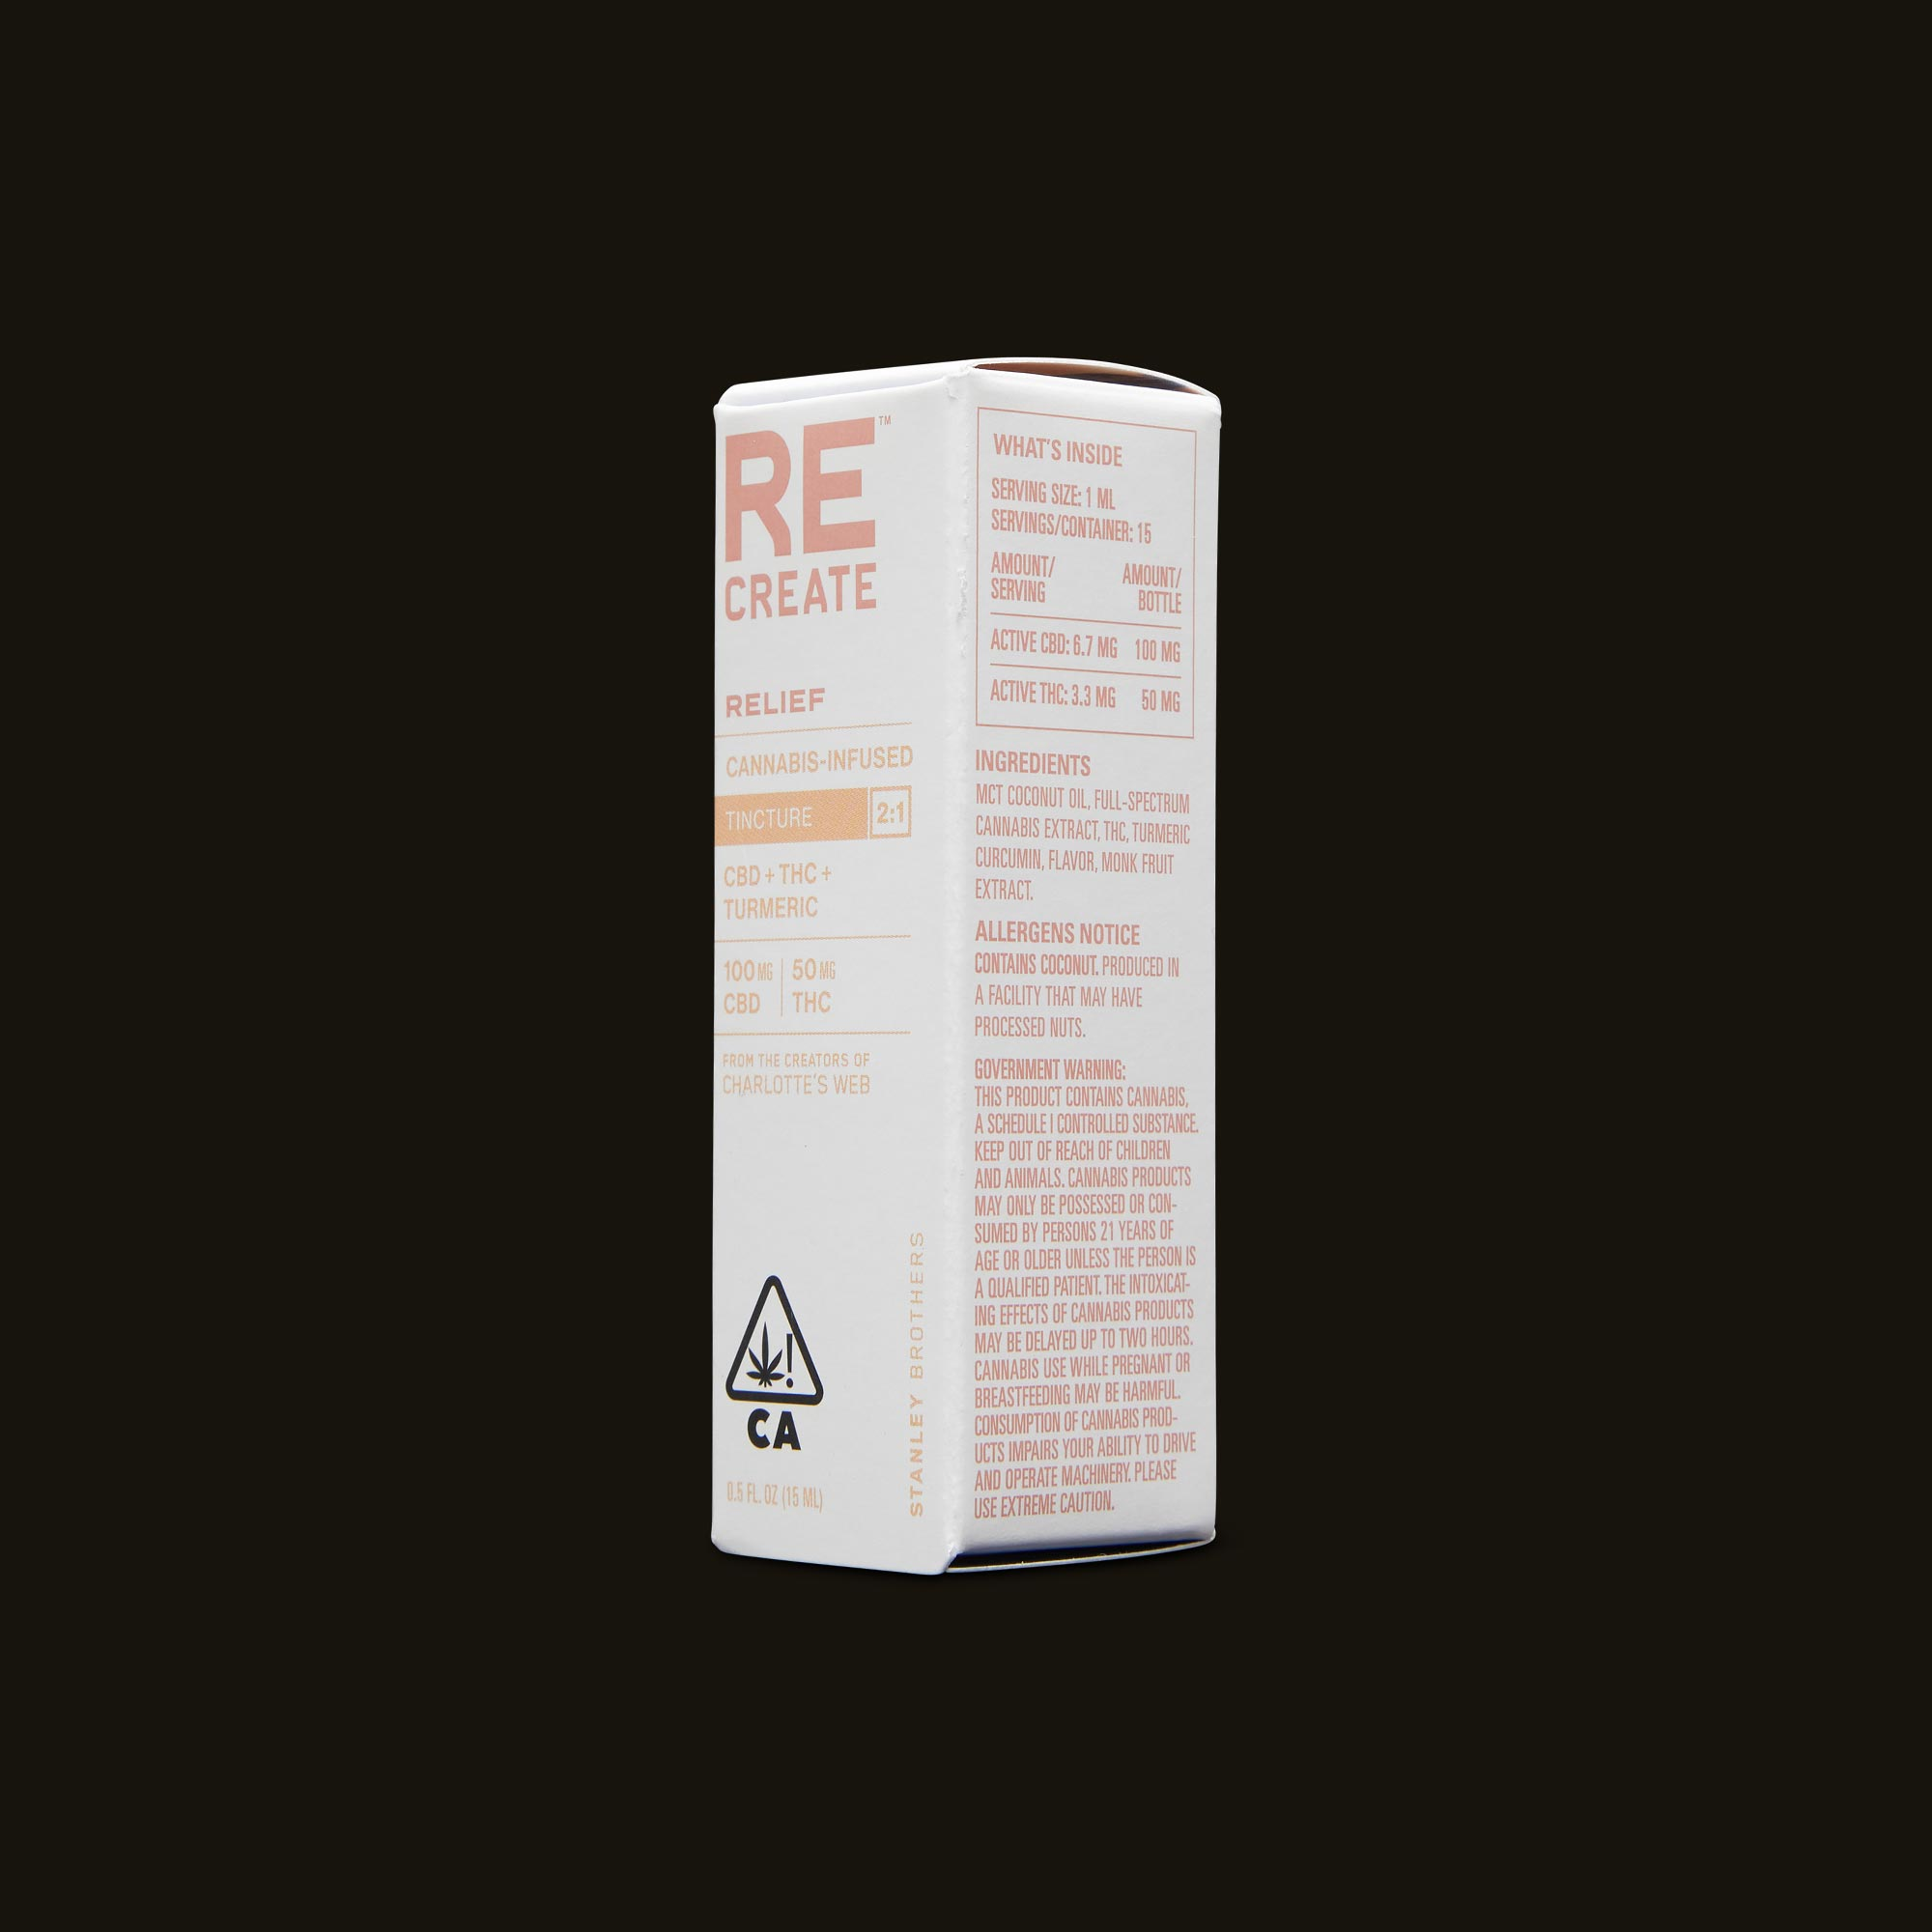 ReCreate Relief Tincture - 15ml Ingredients